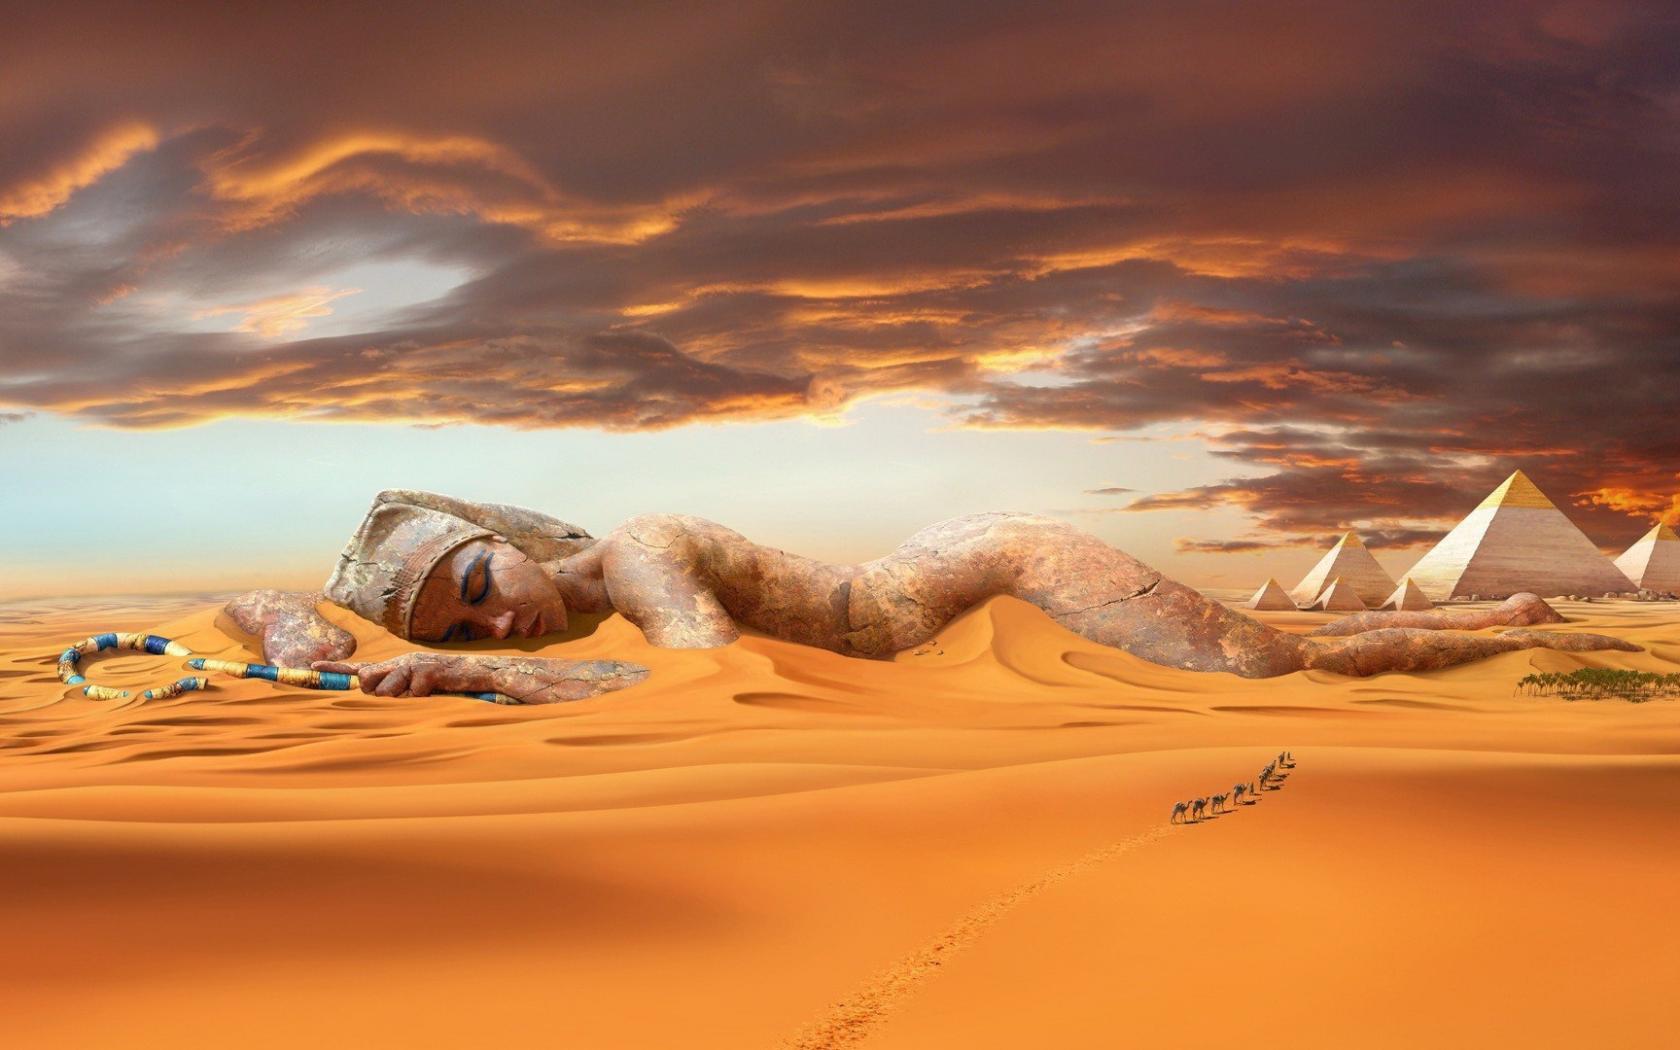 egypt_desert_statue_hd_wallpaper-1680×1050